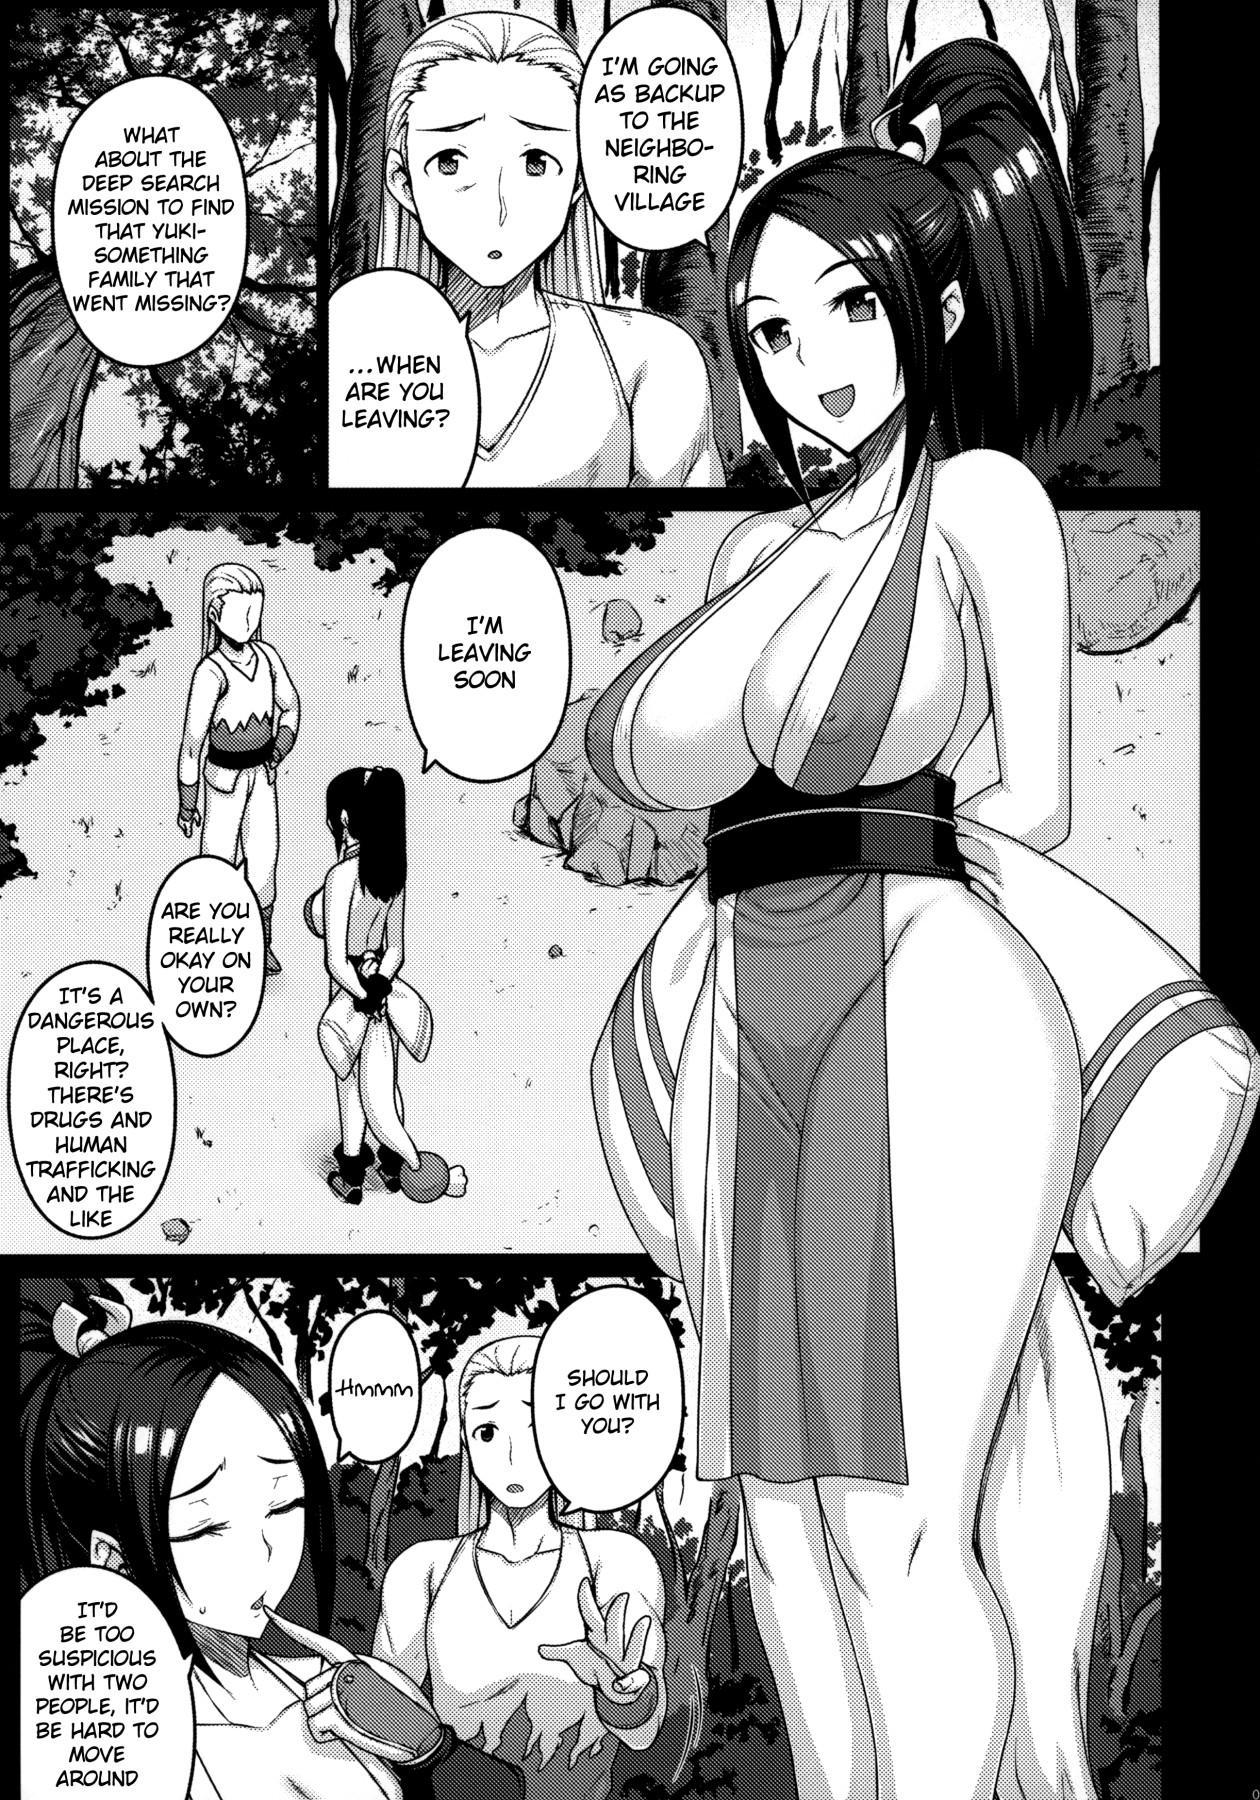 Daraku no hana | Flower of depravity 3